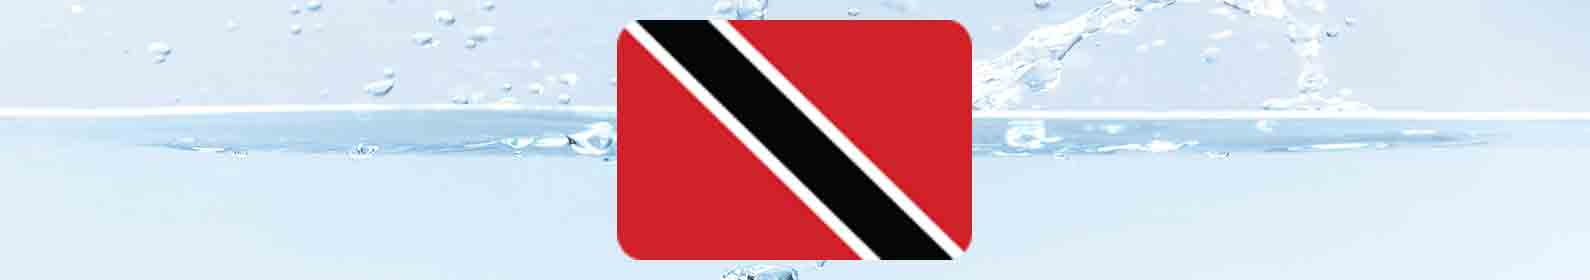 water-treatment-trinidad-and-tobago.jpg